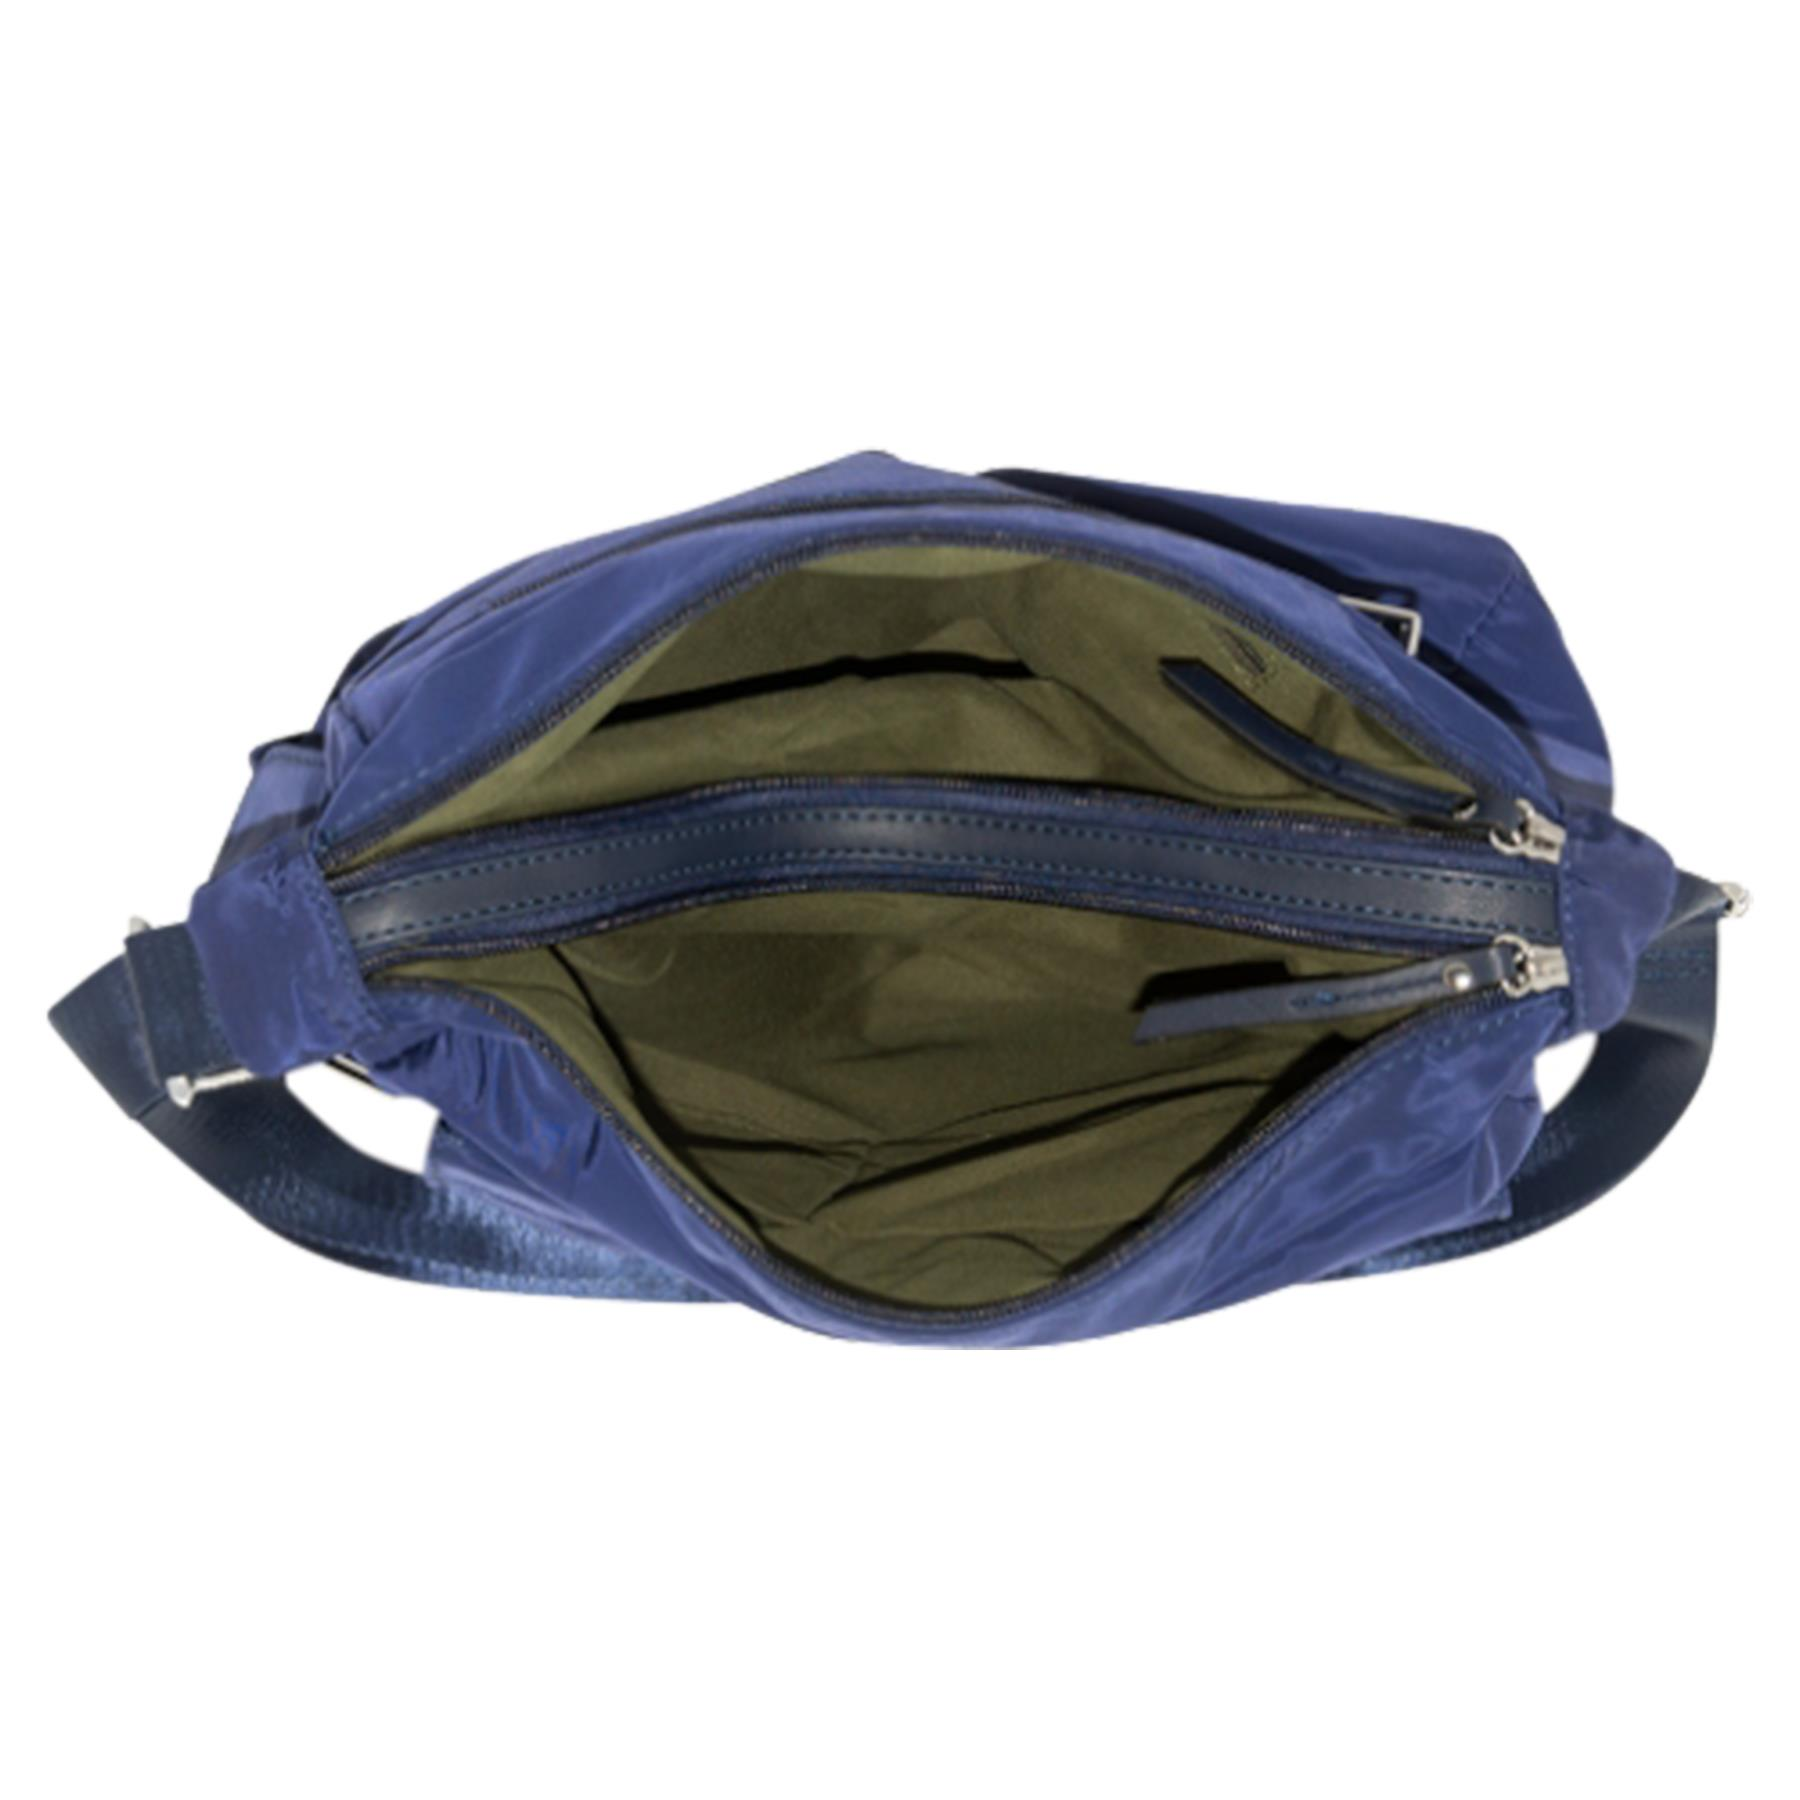 New-Ladies-Men-s-Showerproof-School-College-Practical-Basic-Crossbody-Bag thumbnail 15